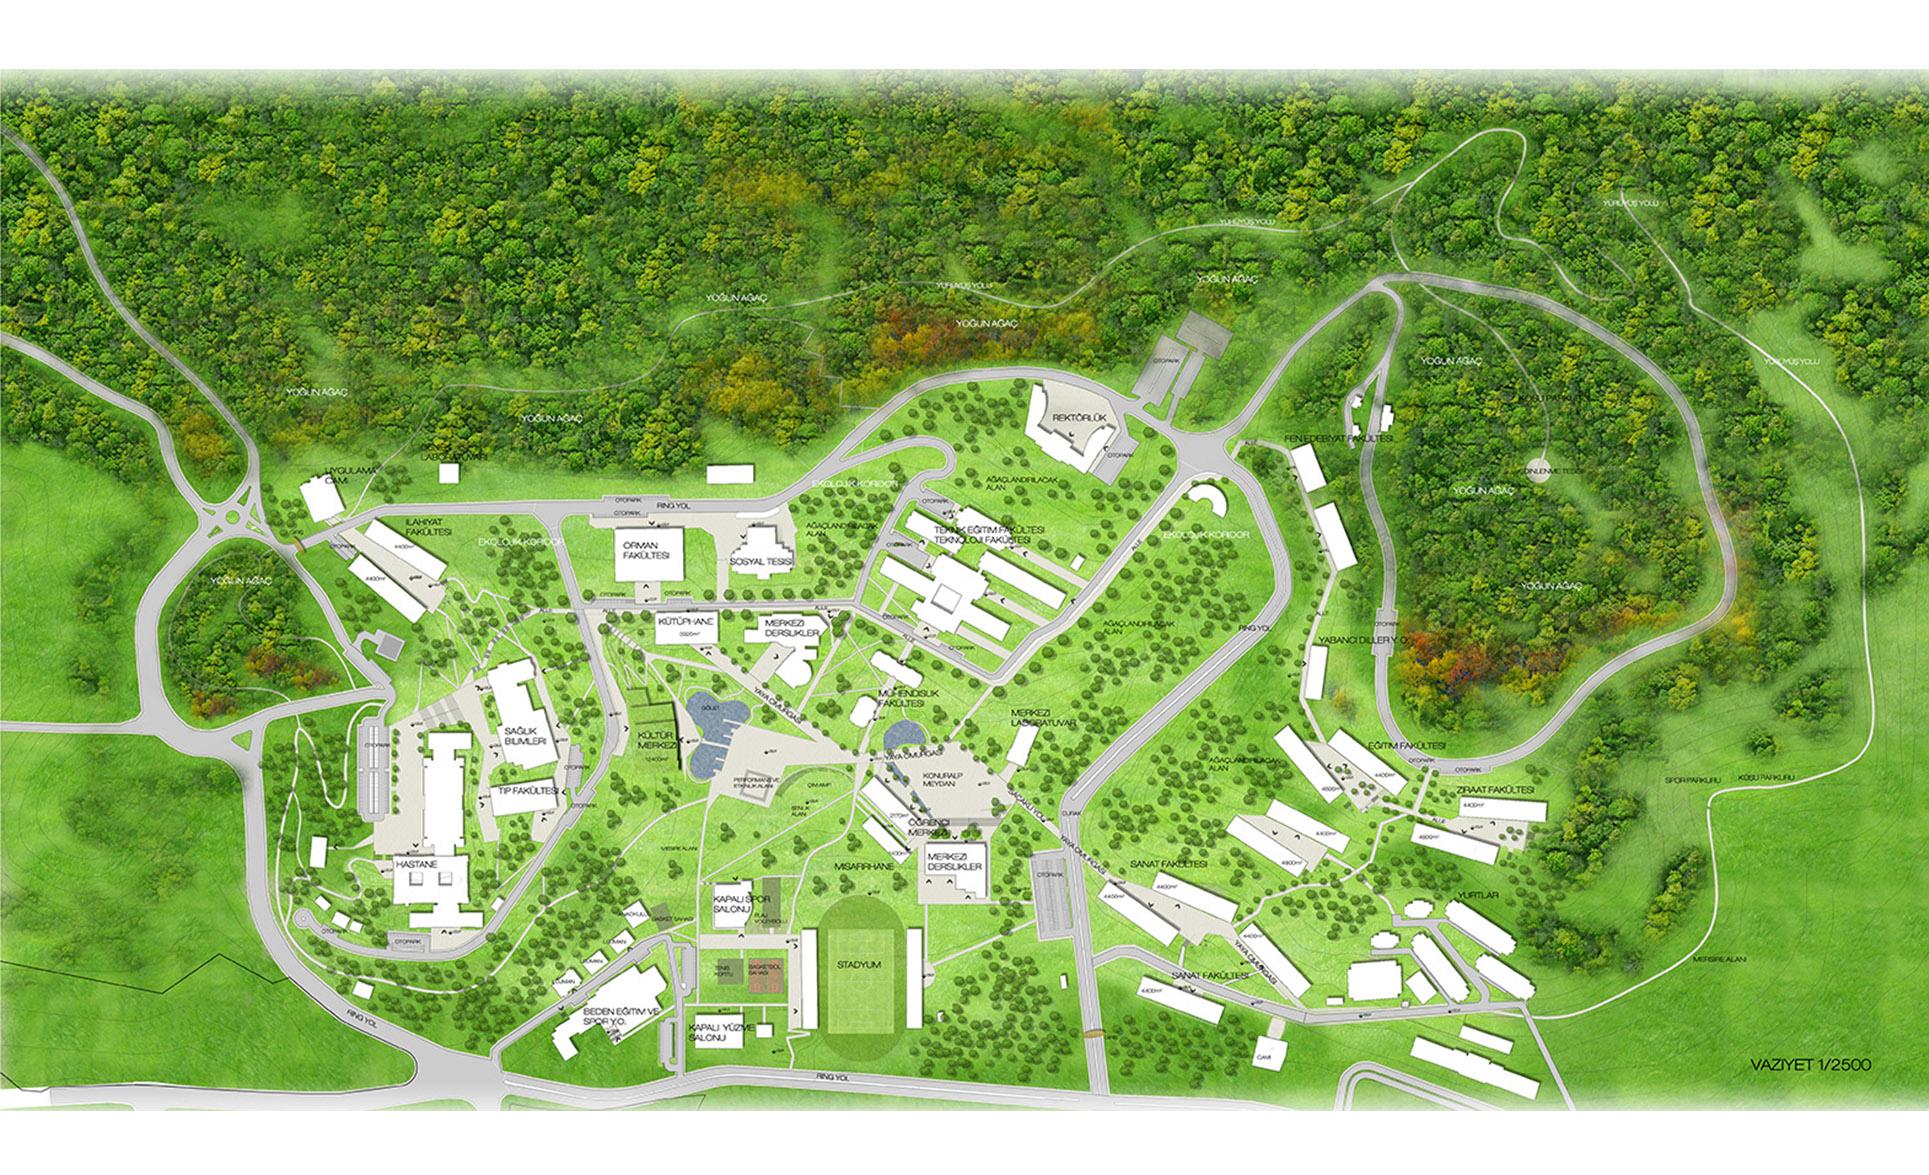 dodofis mimarlık üniversite master planı 4